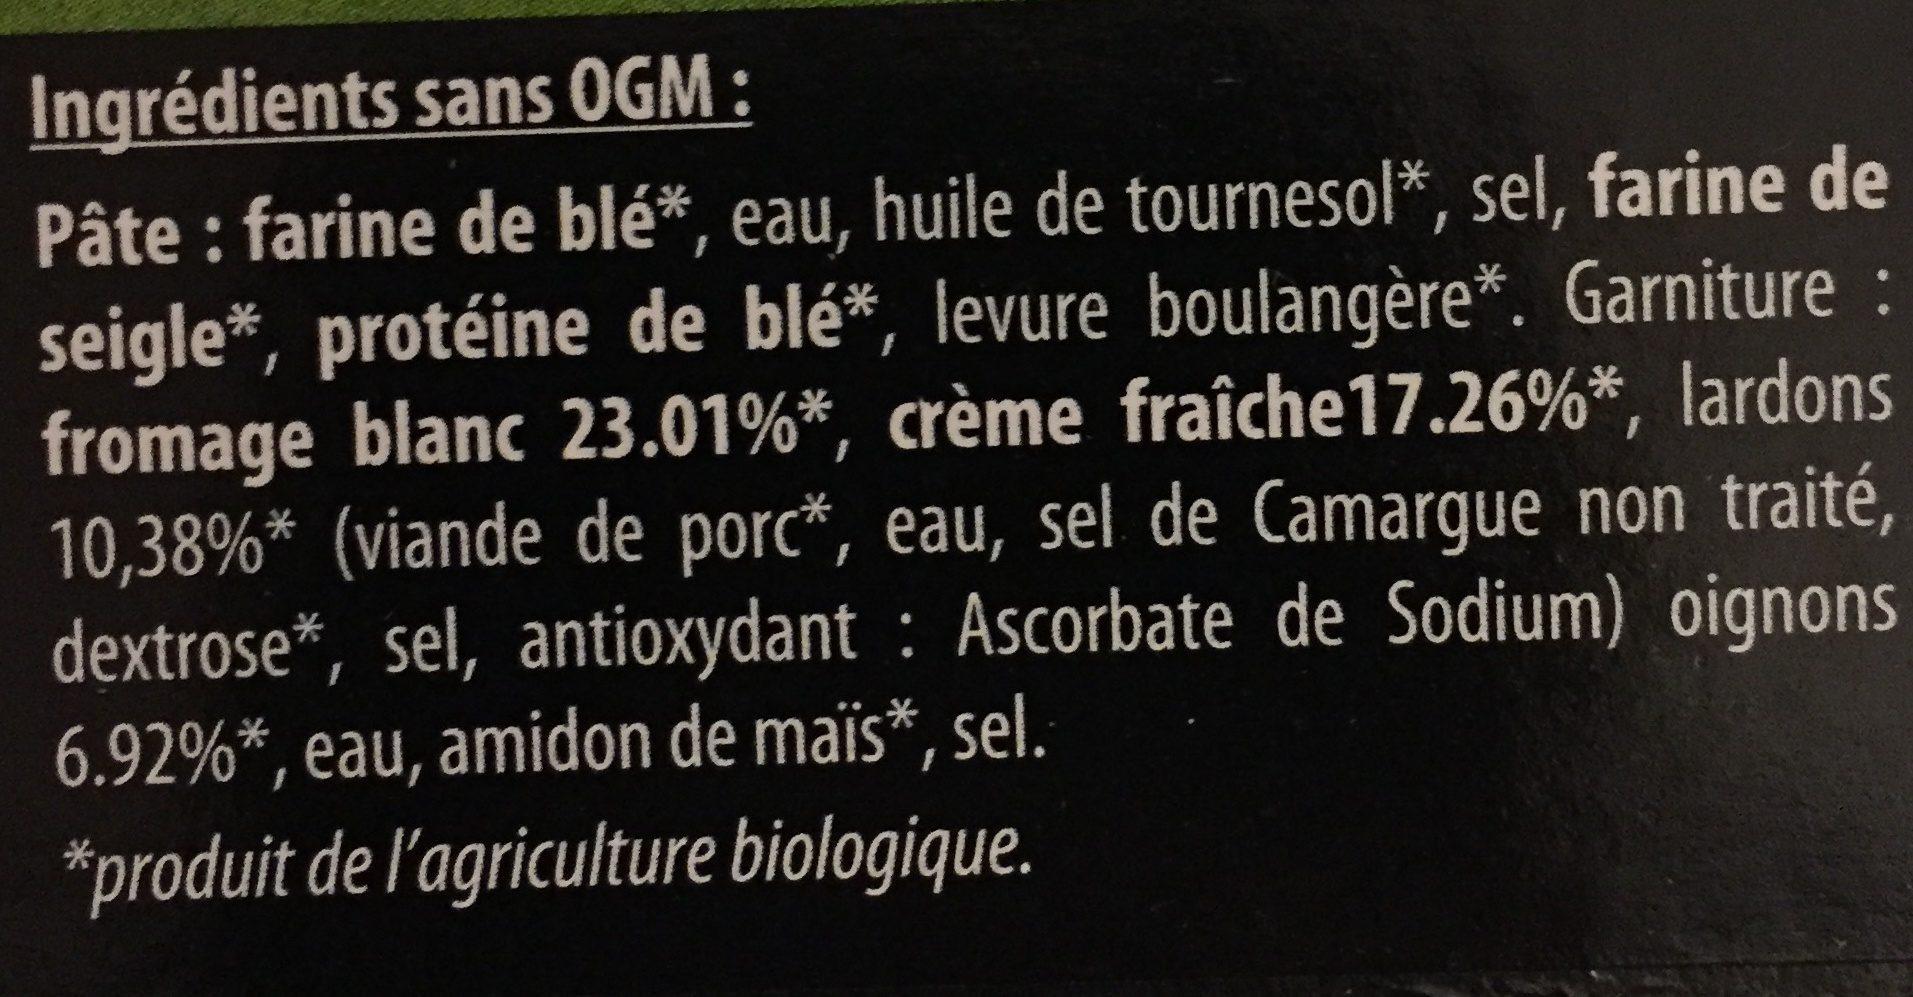 Tartes Flambées d'Alsace - Flammekueche Tradition - Ingredients - fr